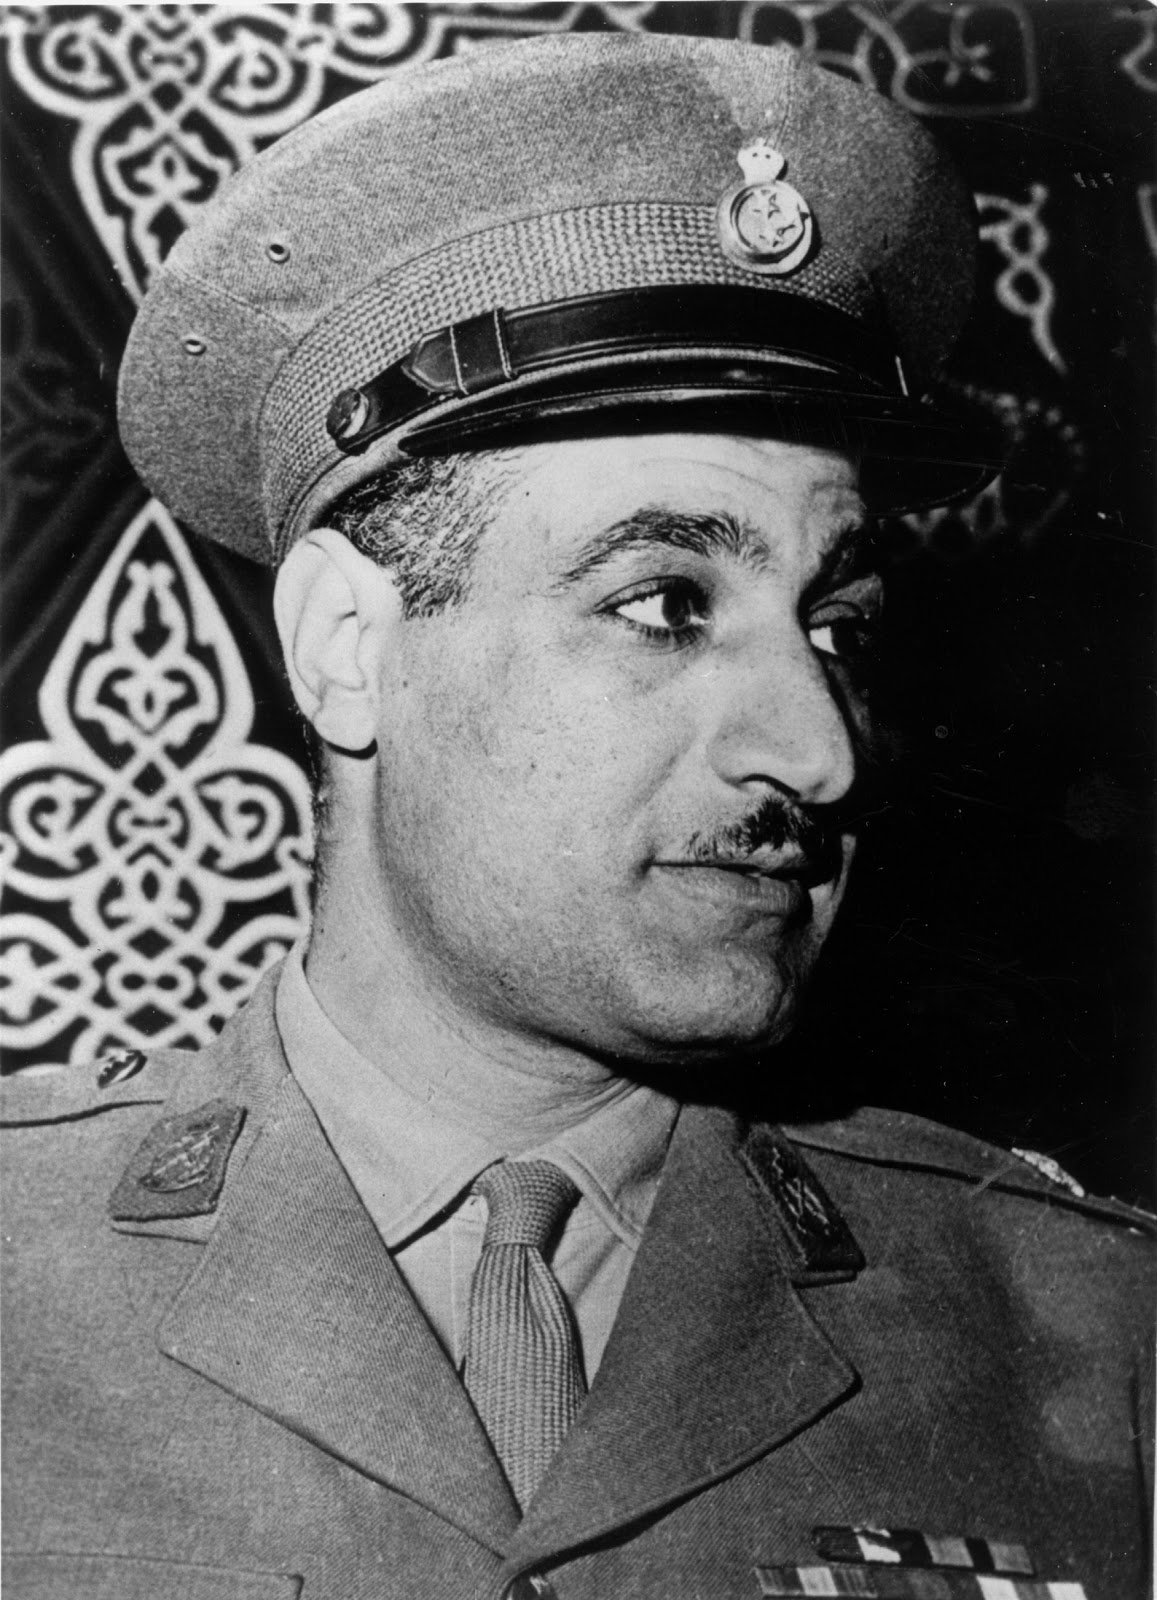 the gamal abdel nasser Some background gamal abd el nasser (جمال عبد الناصر) president (and very charismatic leader) of egypt from 1956 until his death in 1970 muslim brotherho.